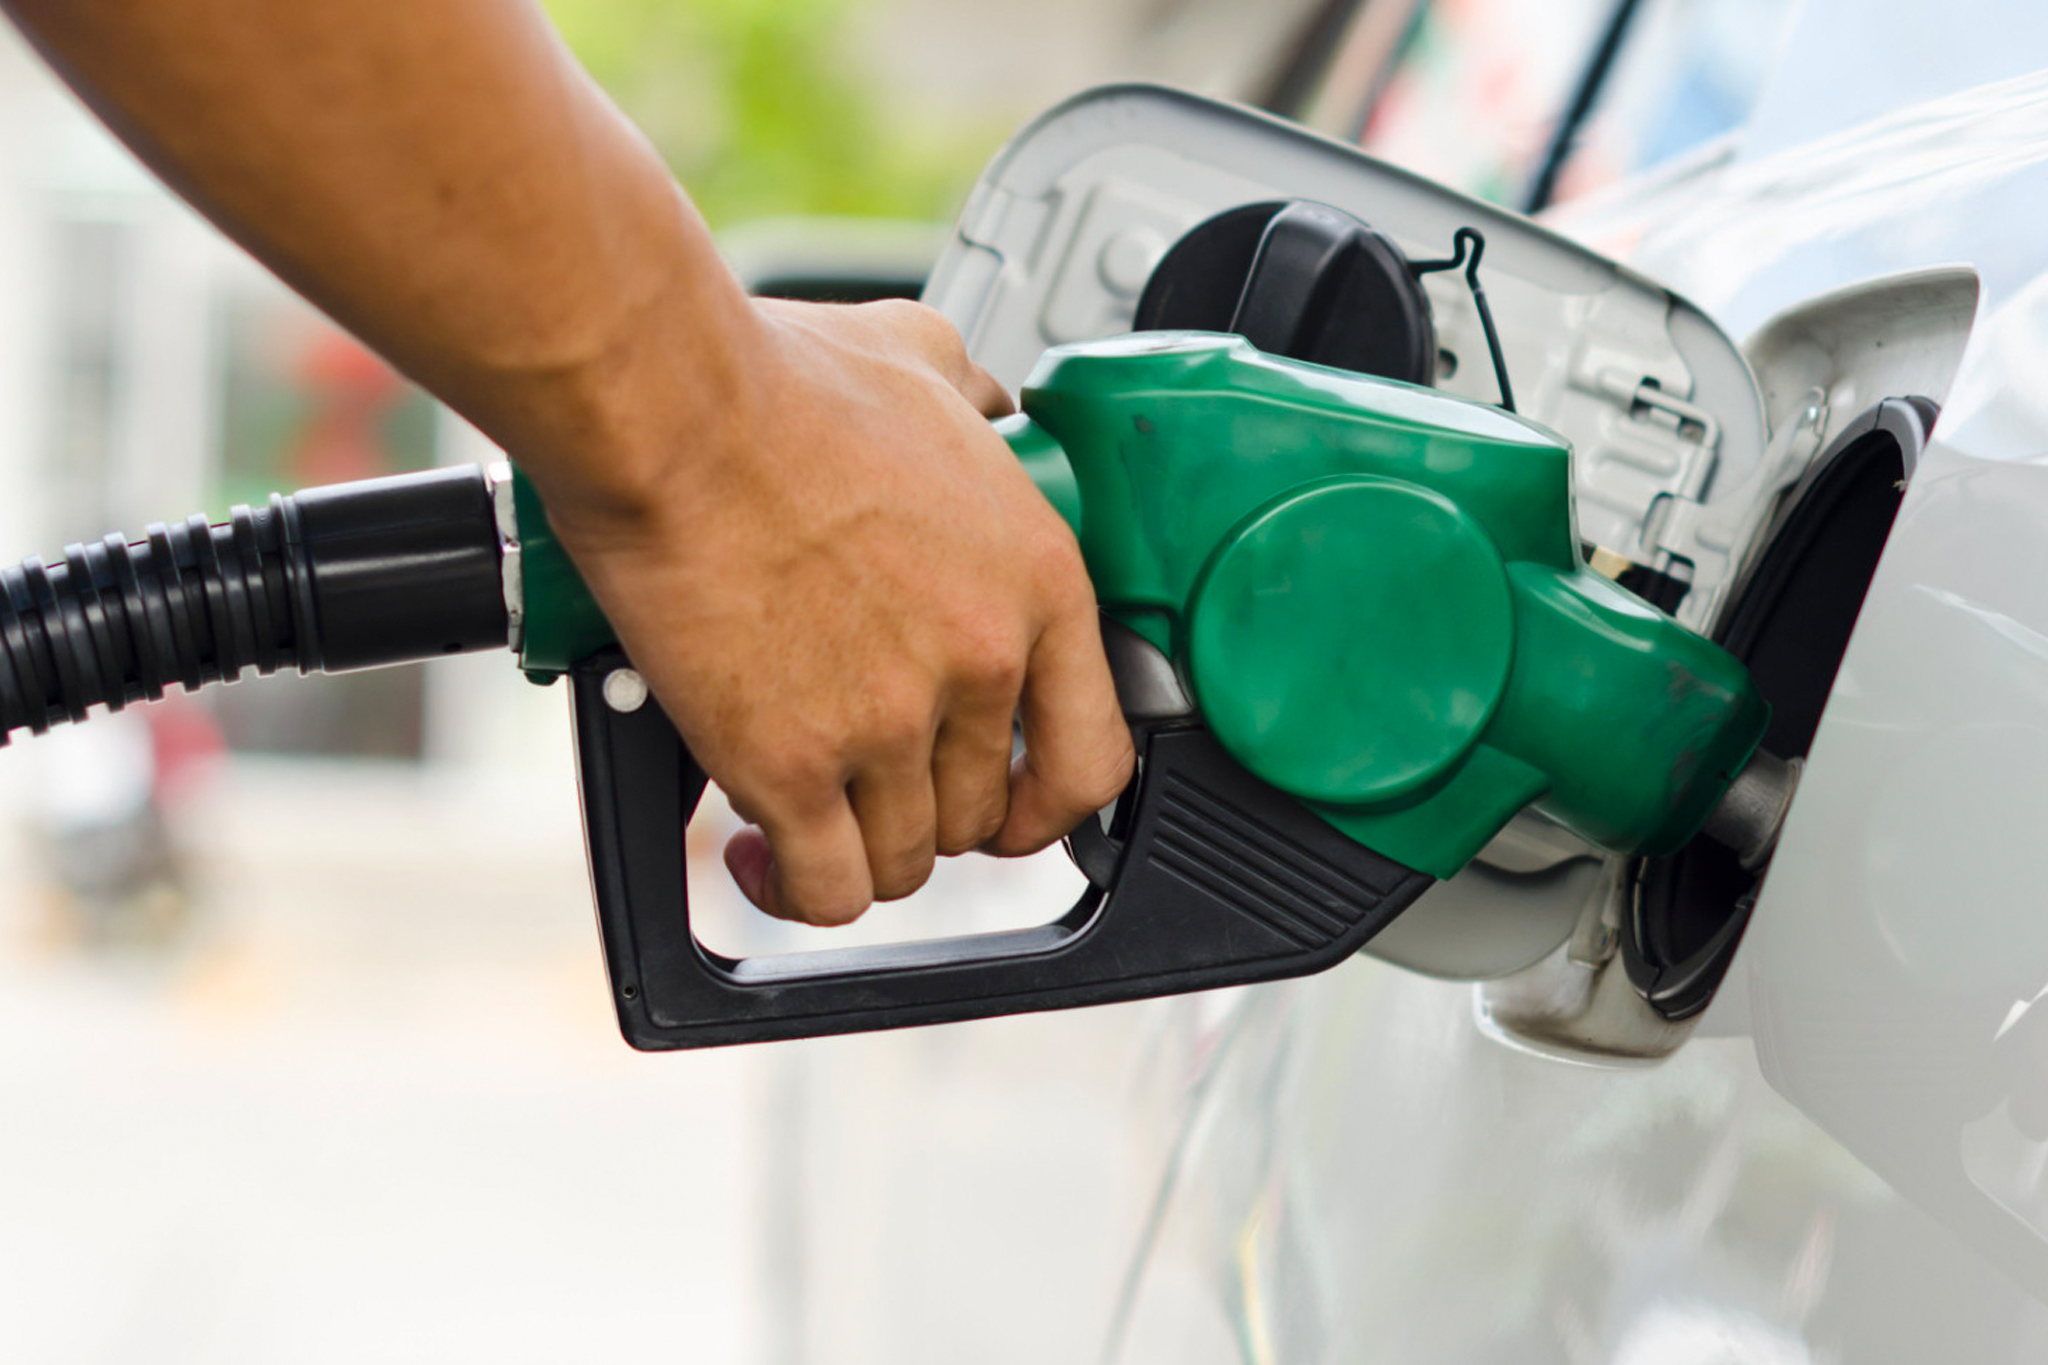 Consejos para ahorrar combustible hero asset